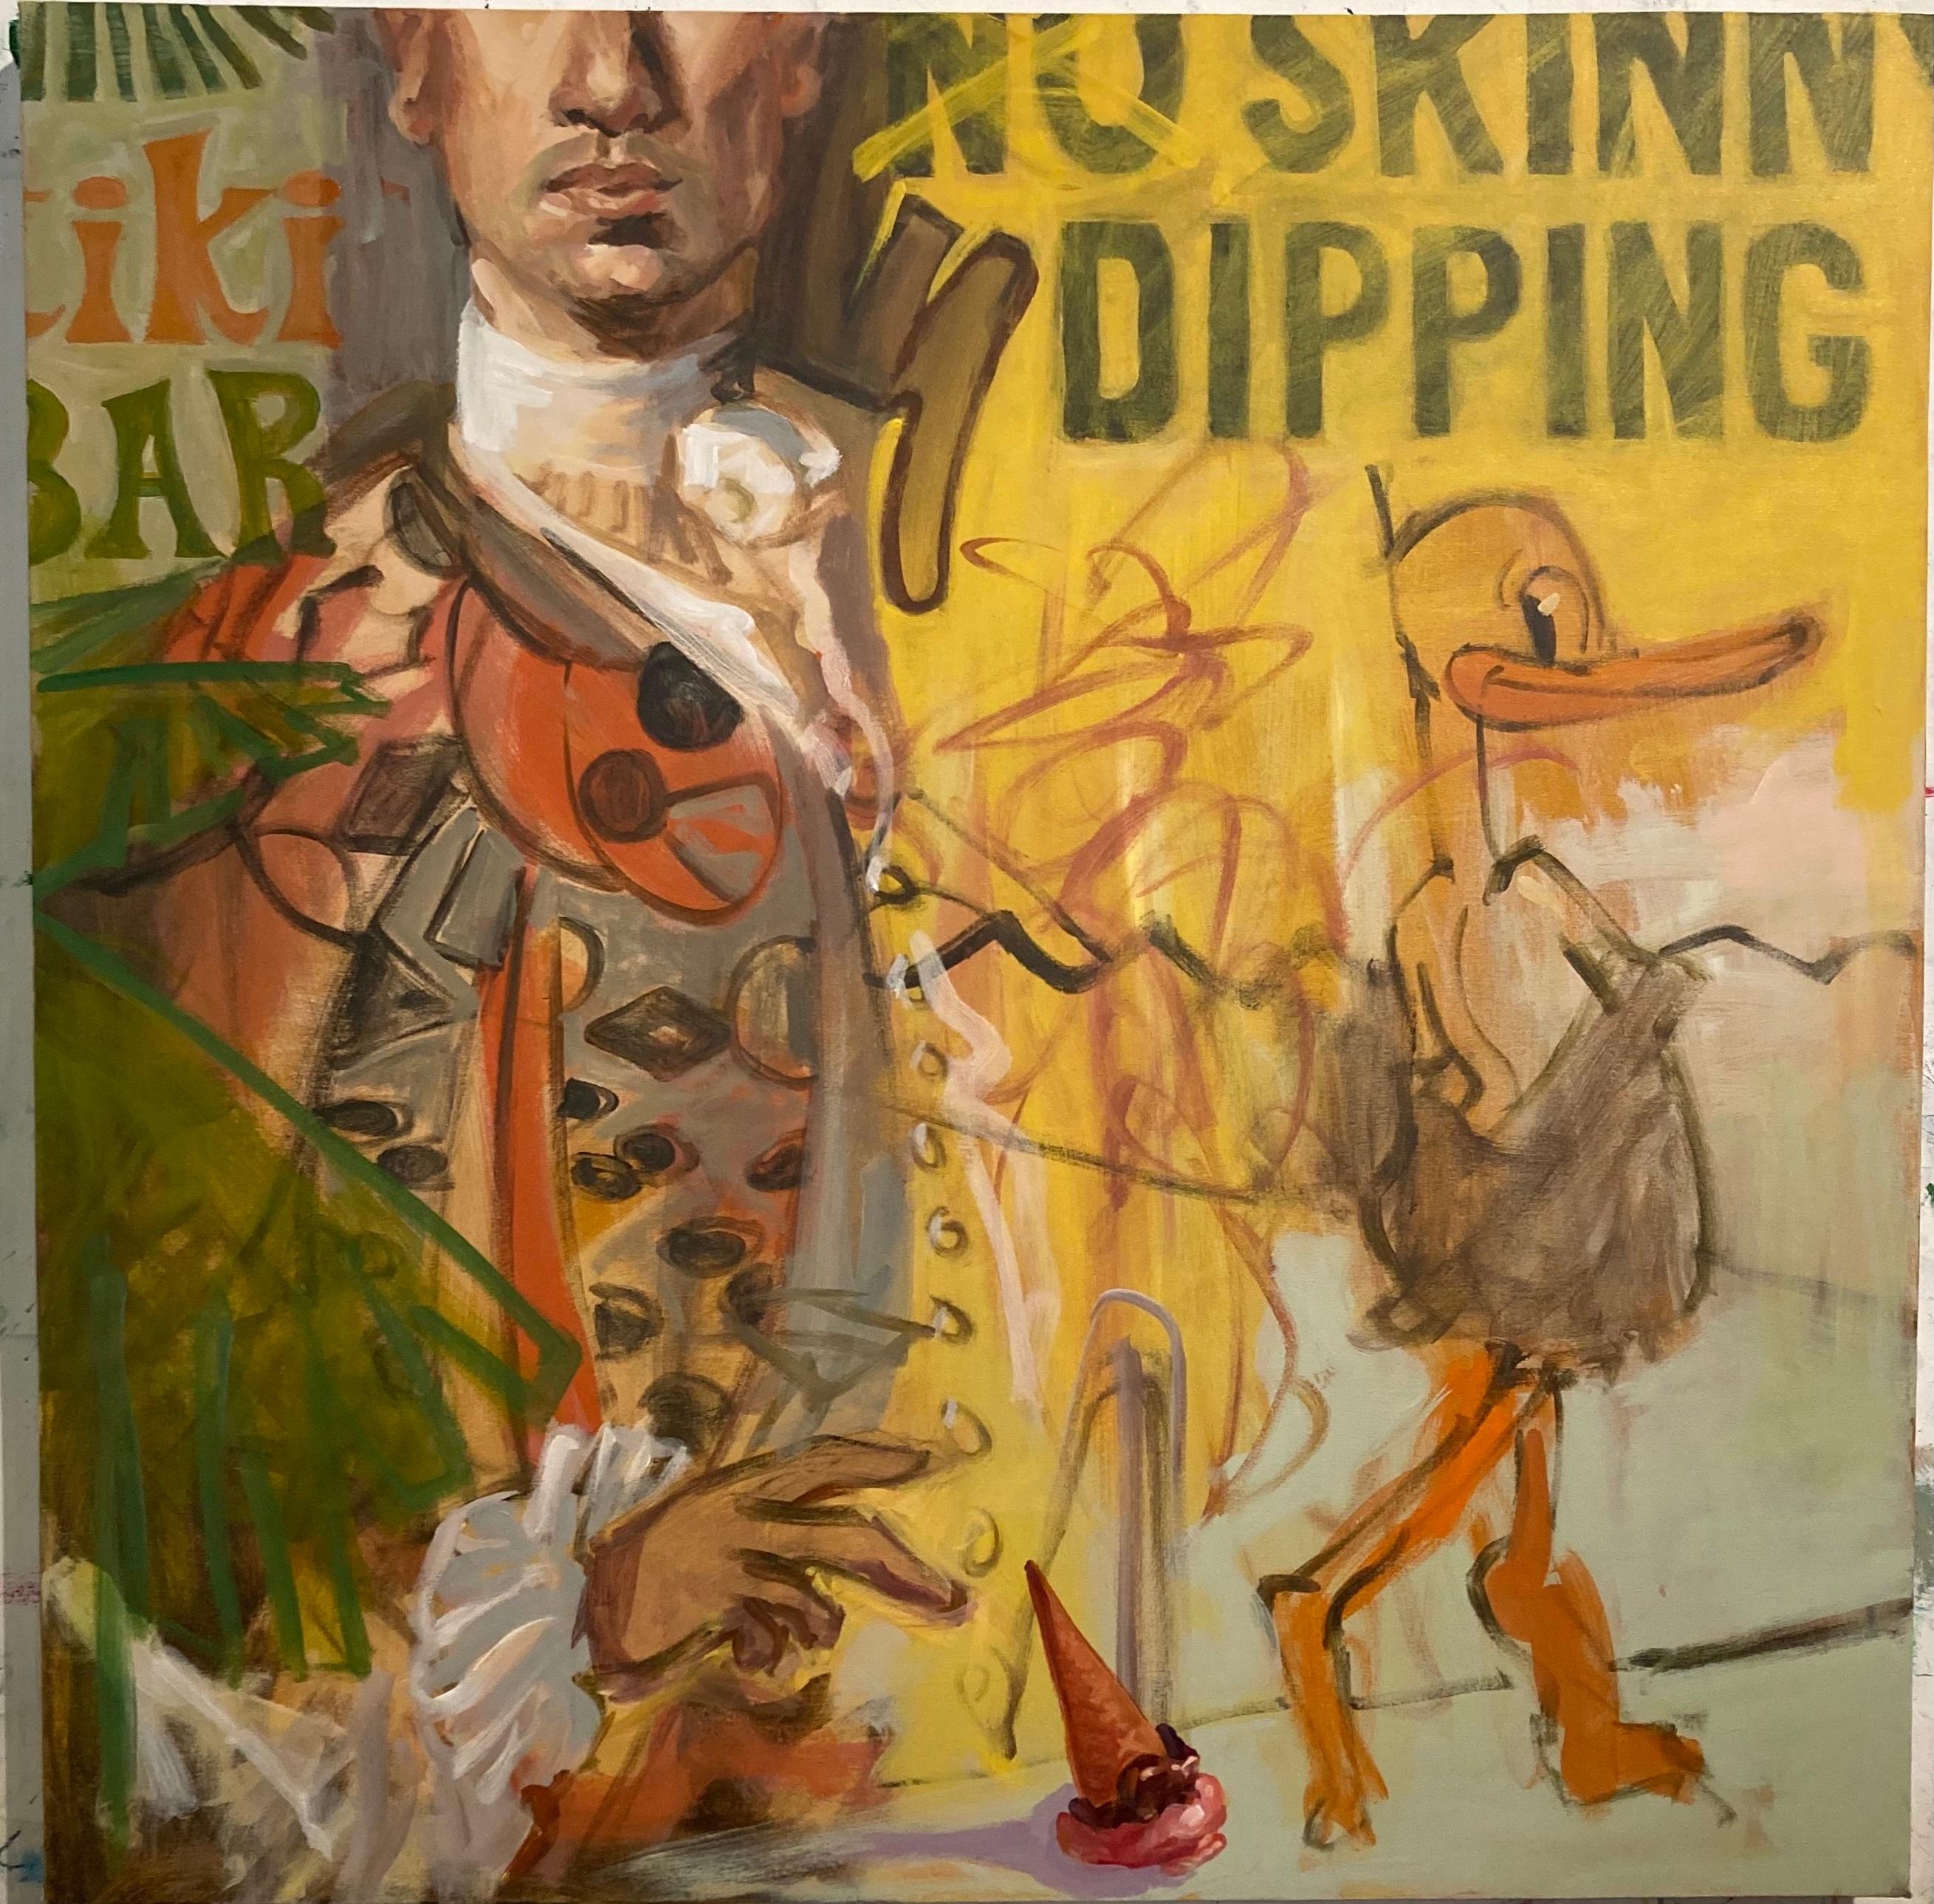 No skinny dipping 2 qipbko